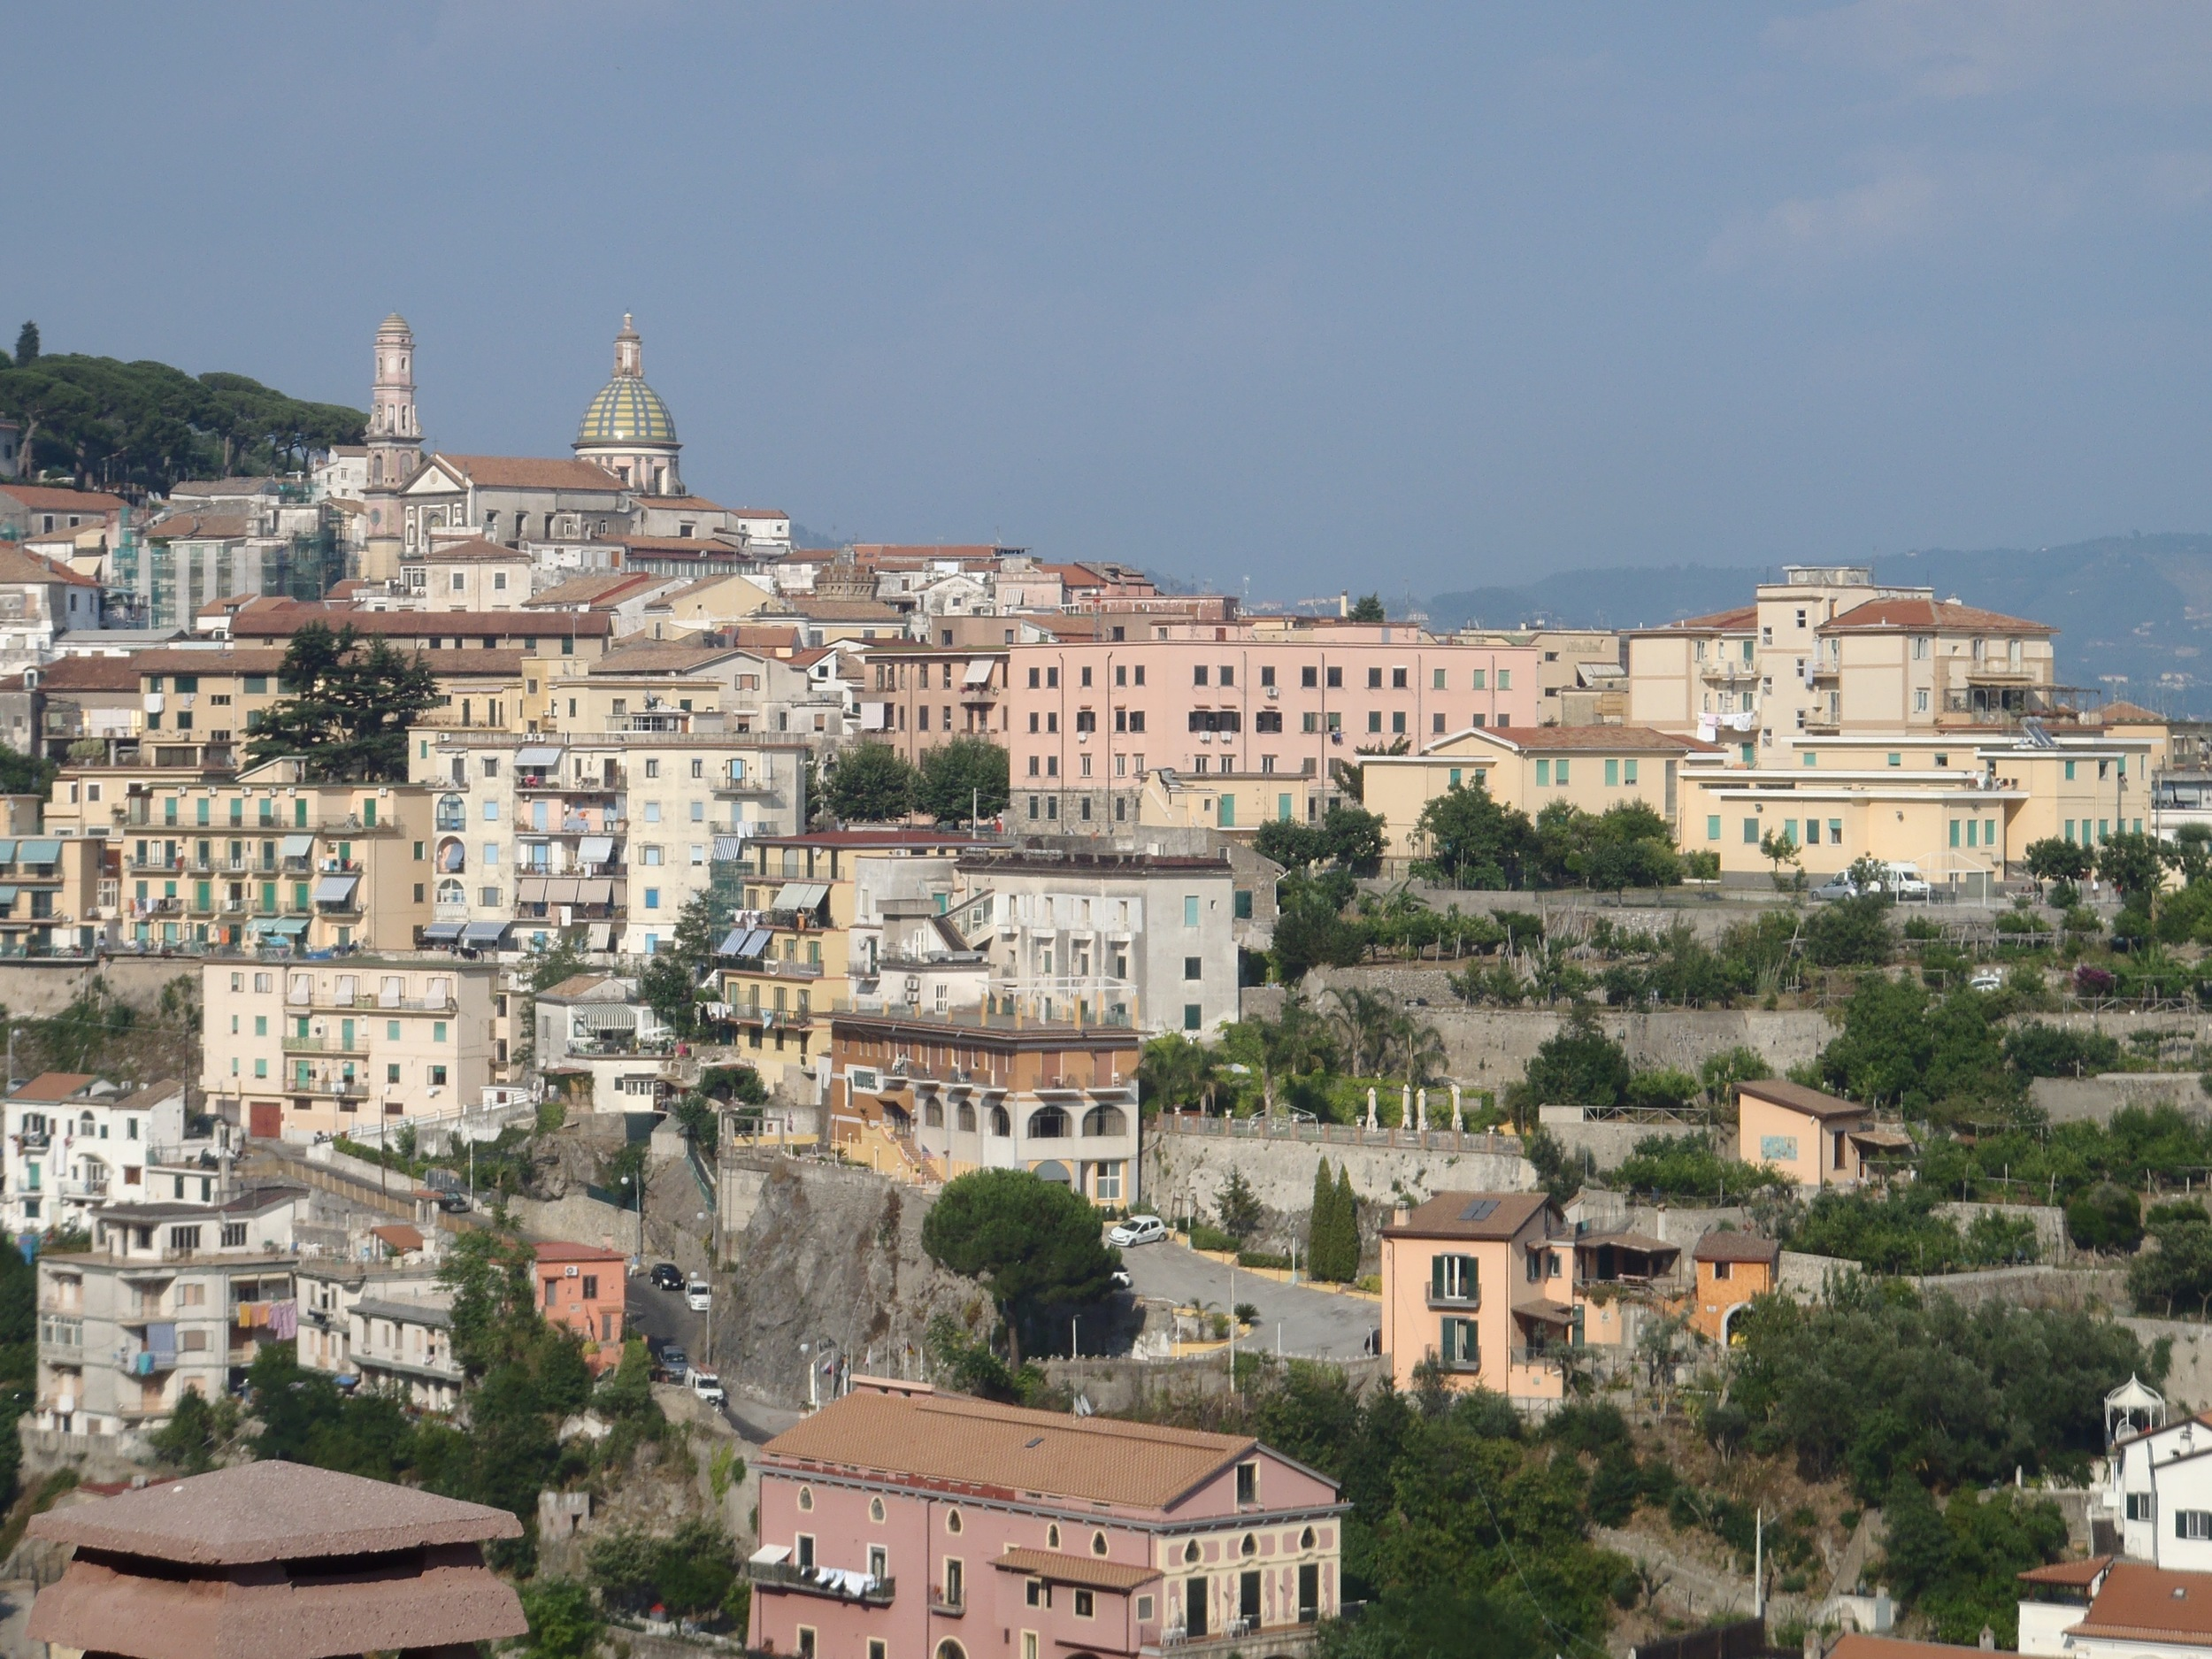 61 Vietri sul Mare Italy 2015.jpg